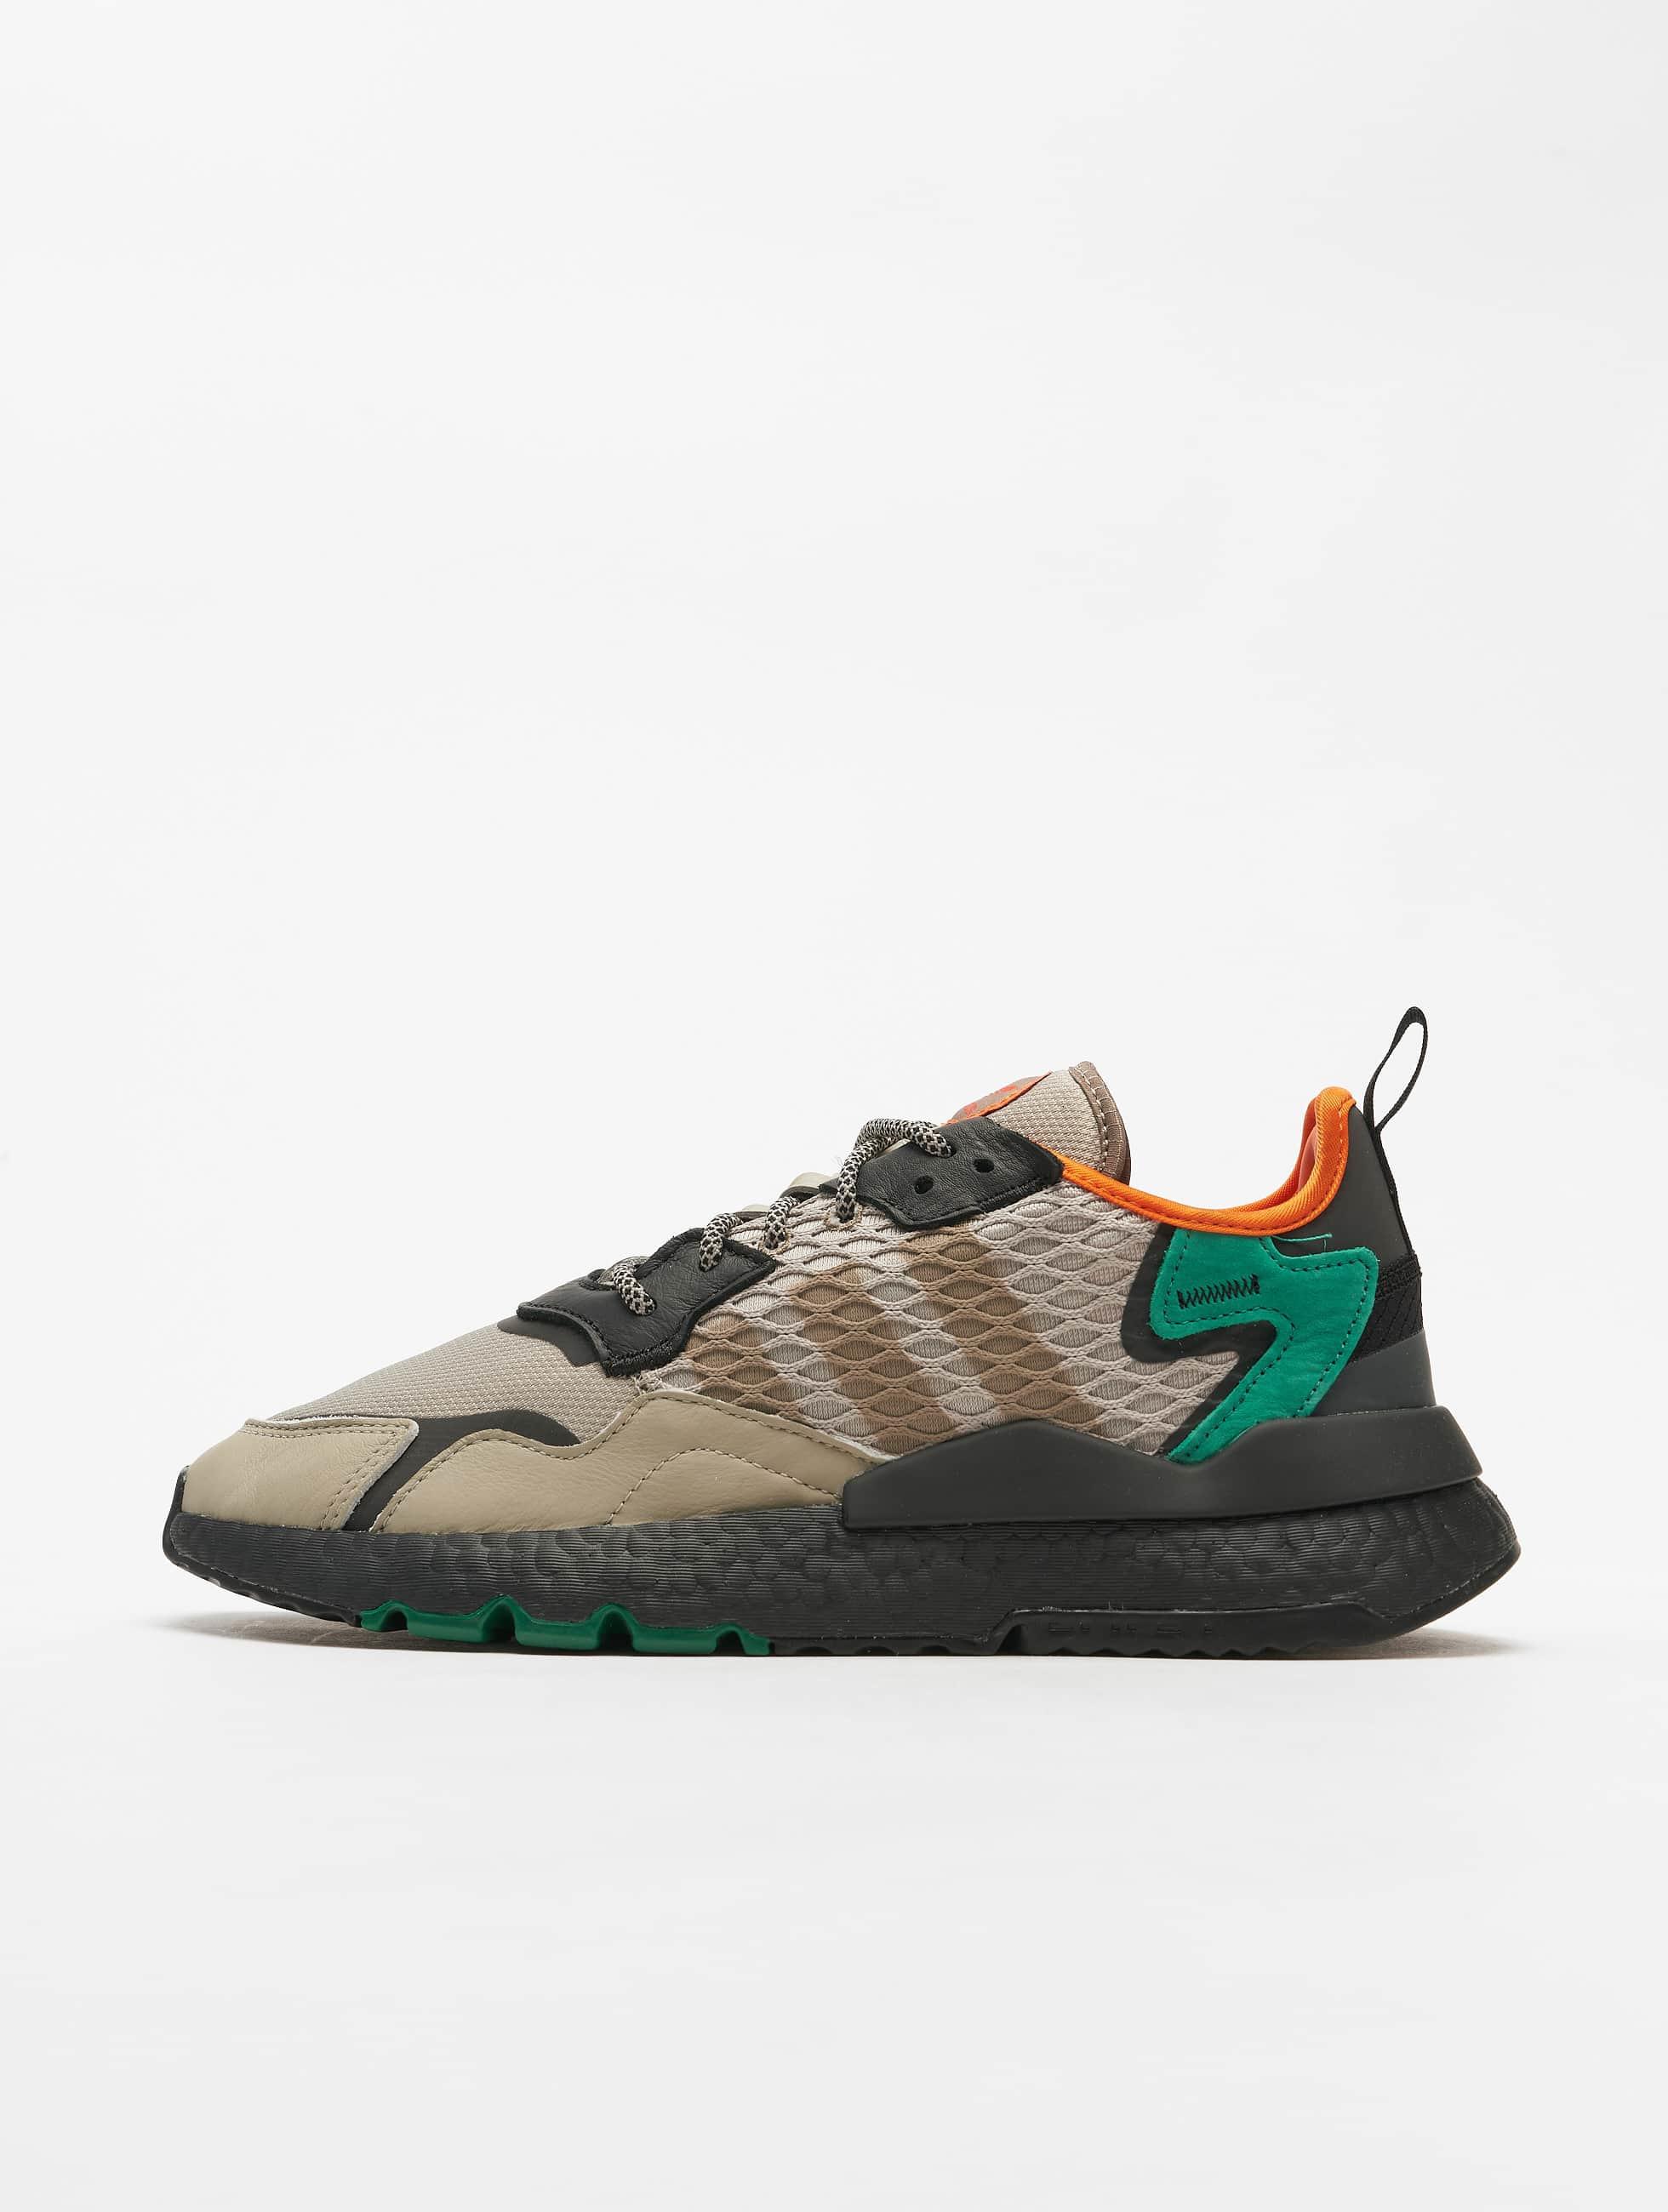 Adidas Originals Nite Jogger Sneakers SesameCore BlackBold Green